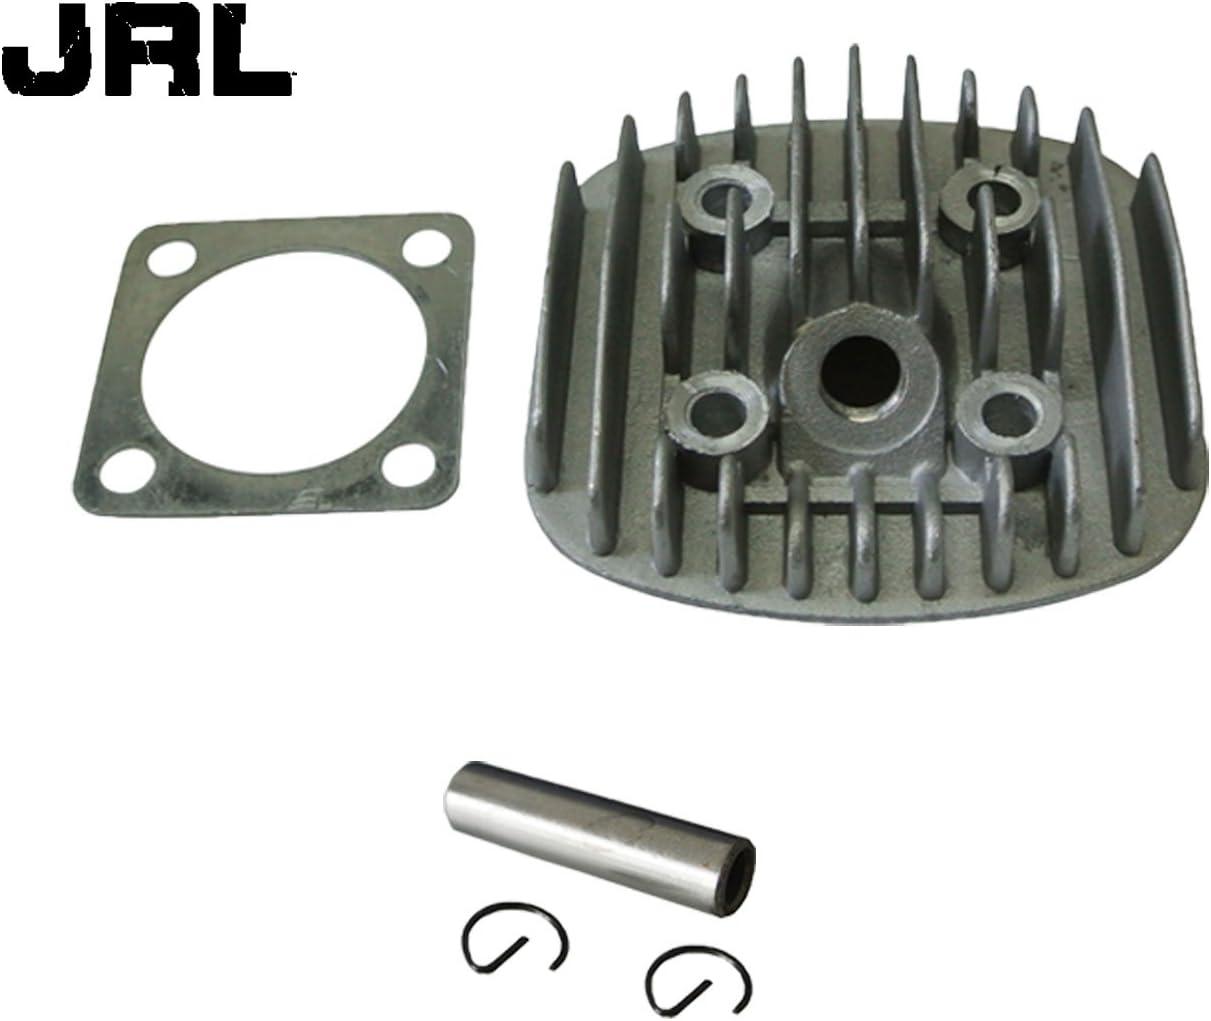 Cylinder Head /& Gasket Set For 2 Stroke Engine Motorized Bike 66cc 70cc 80cc